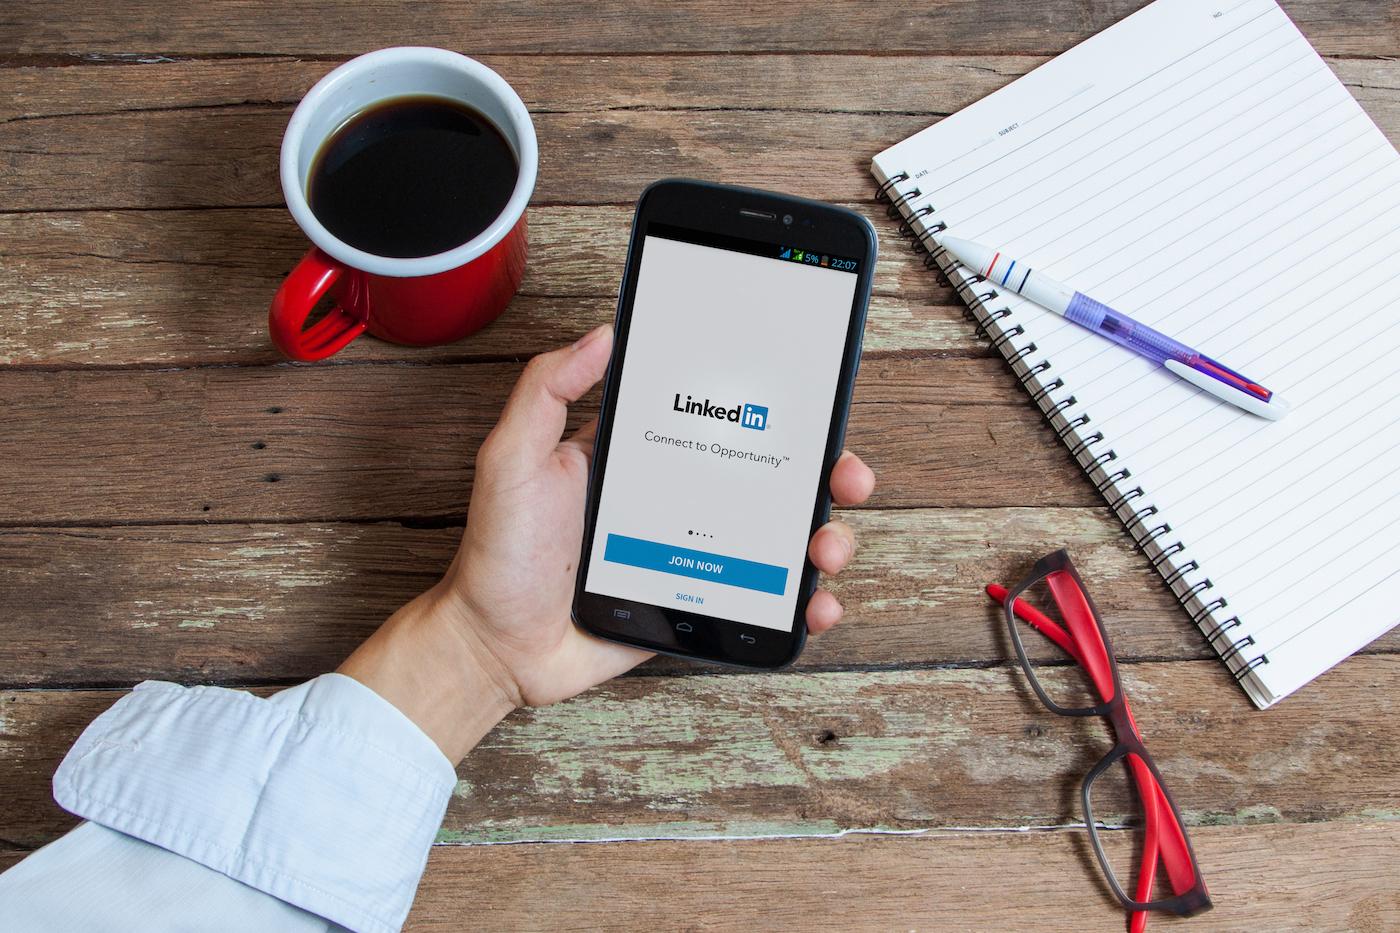 hand-holding-phone-using-linkedin